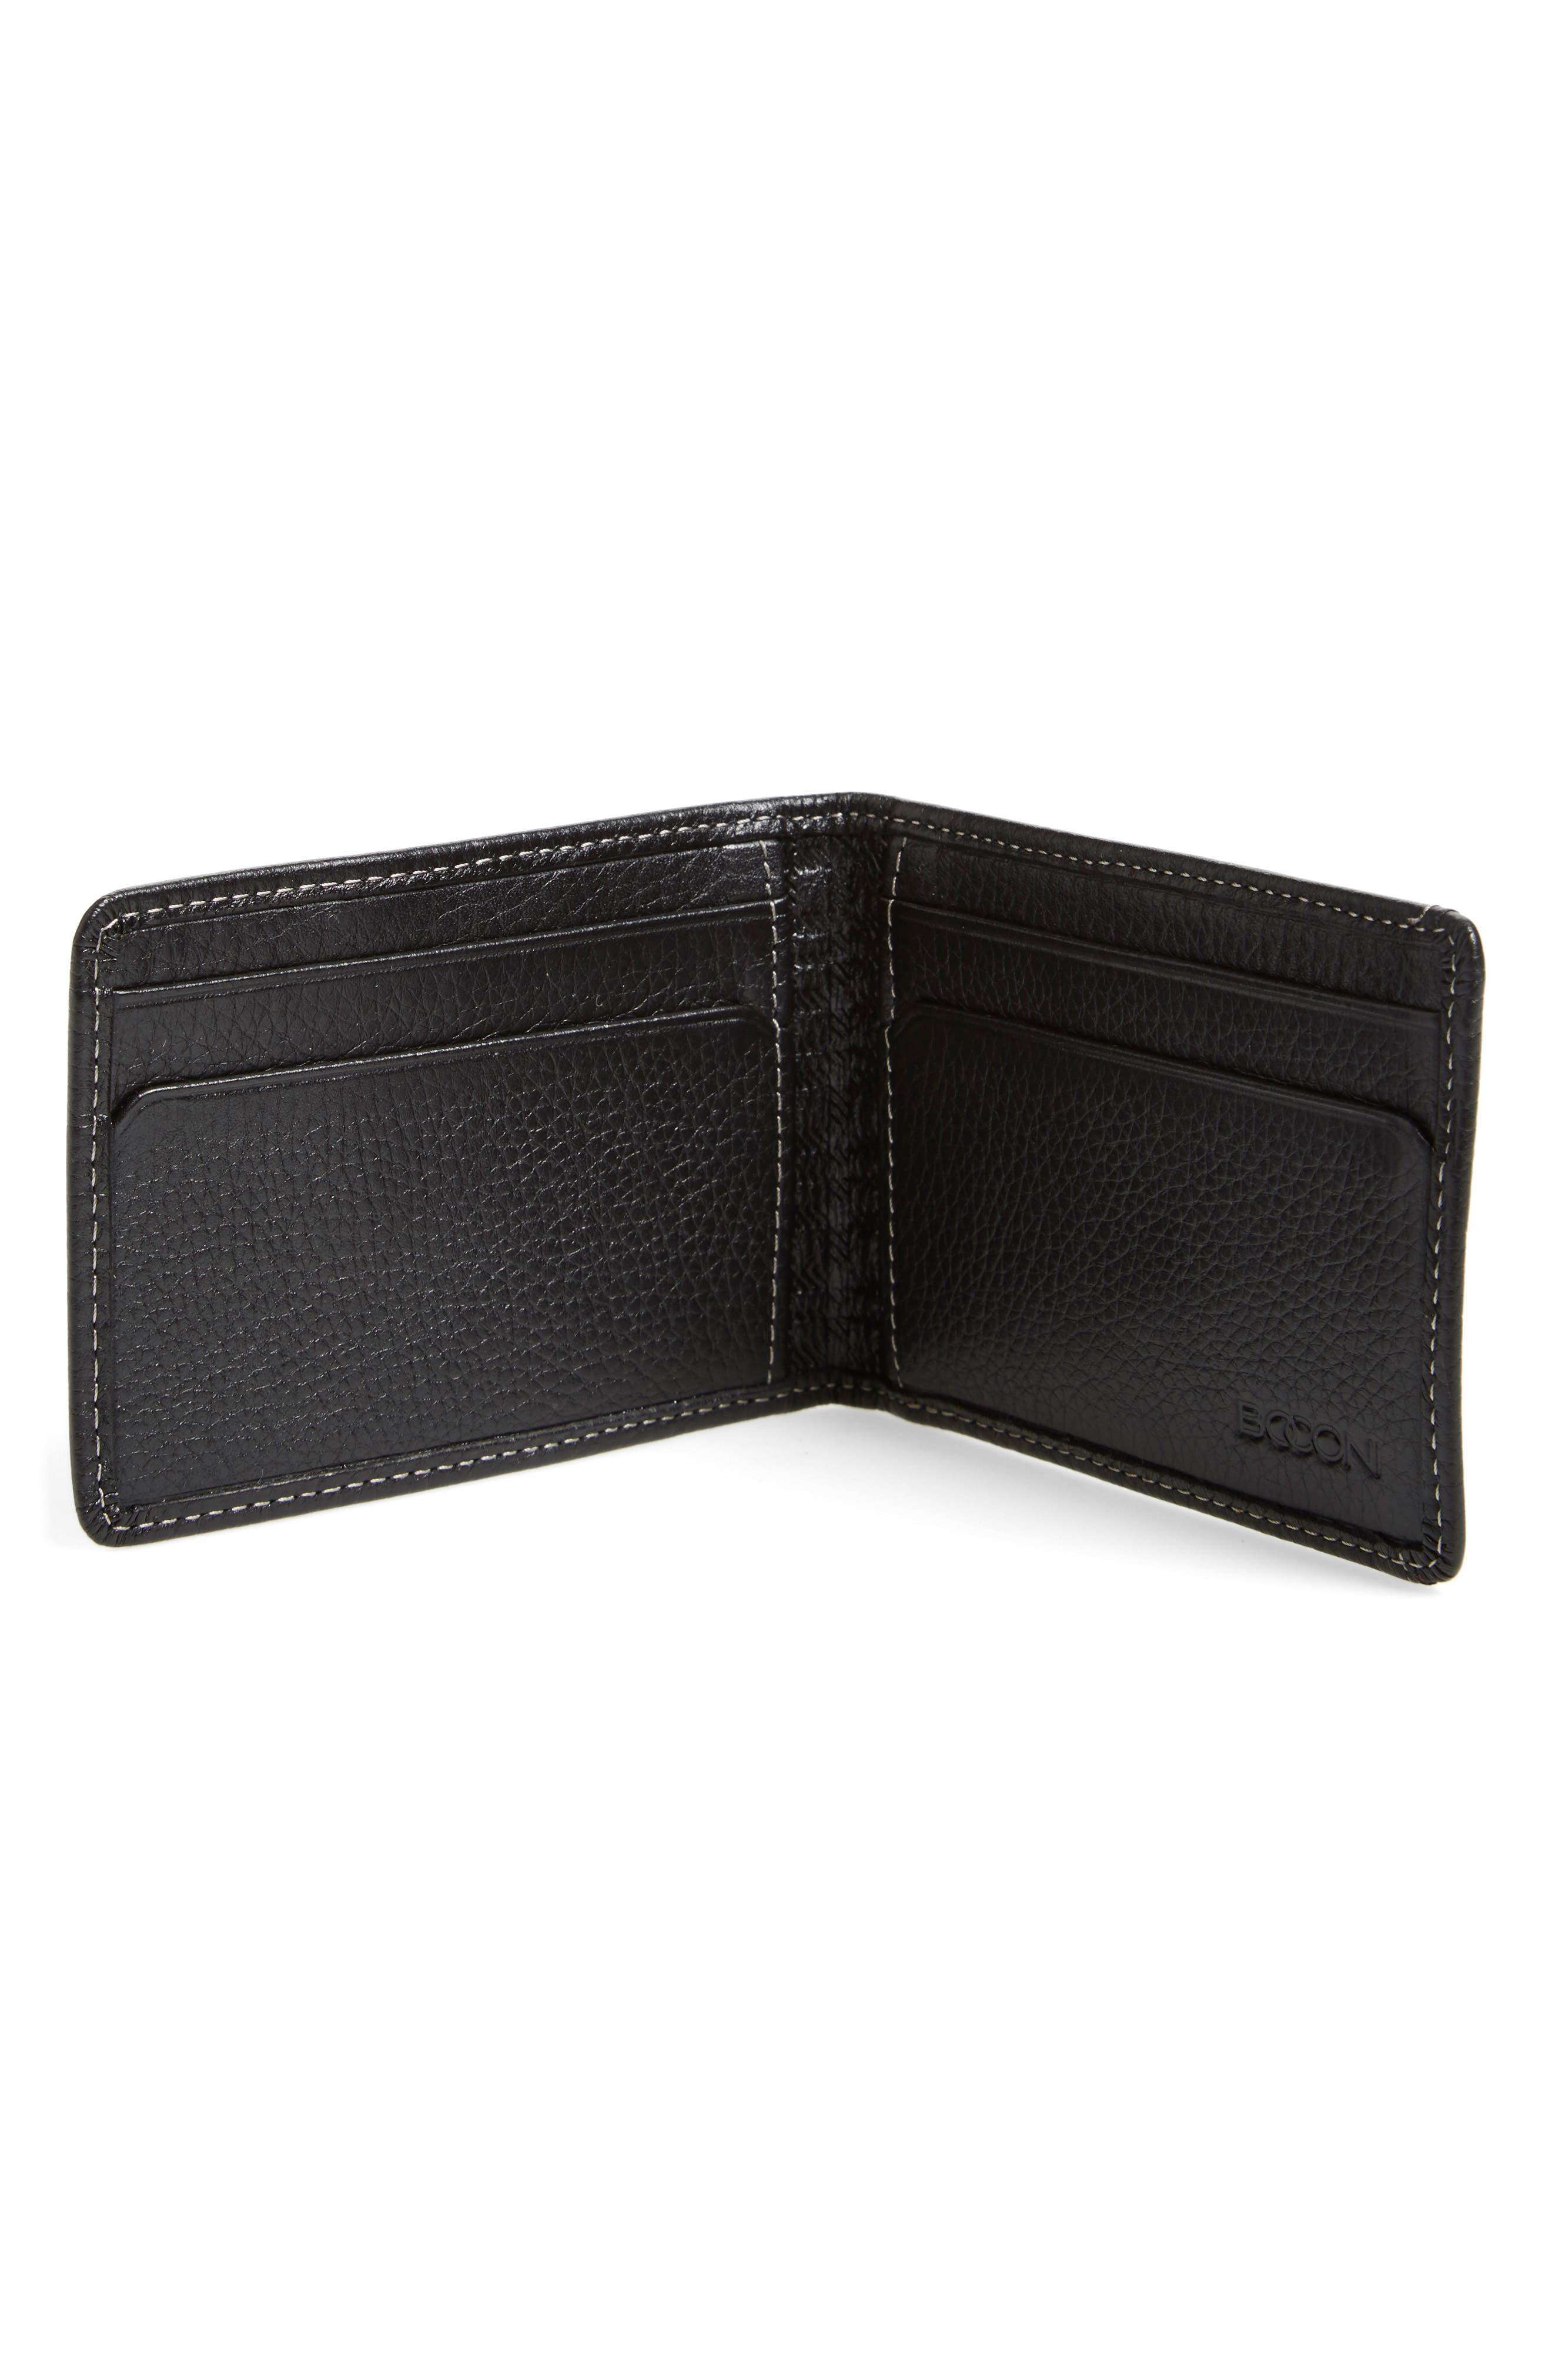 'Tyler' Money Clip Wallet,                             Alternate thumbnail 2, color,                             001